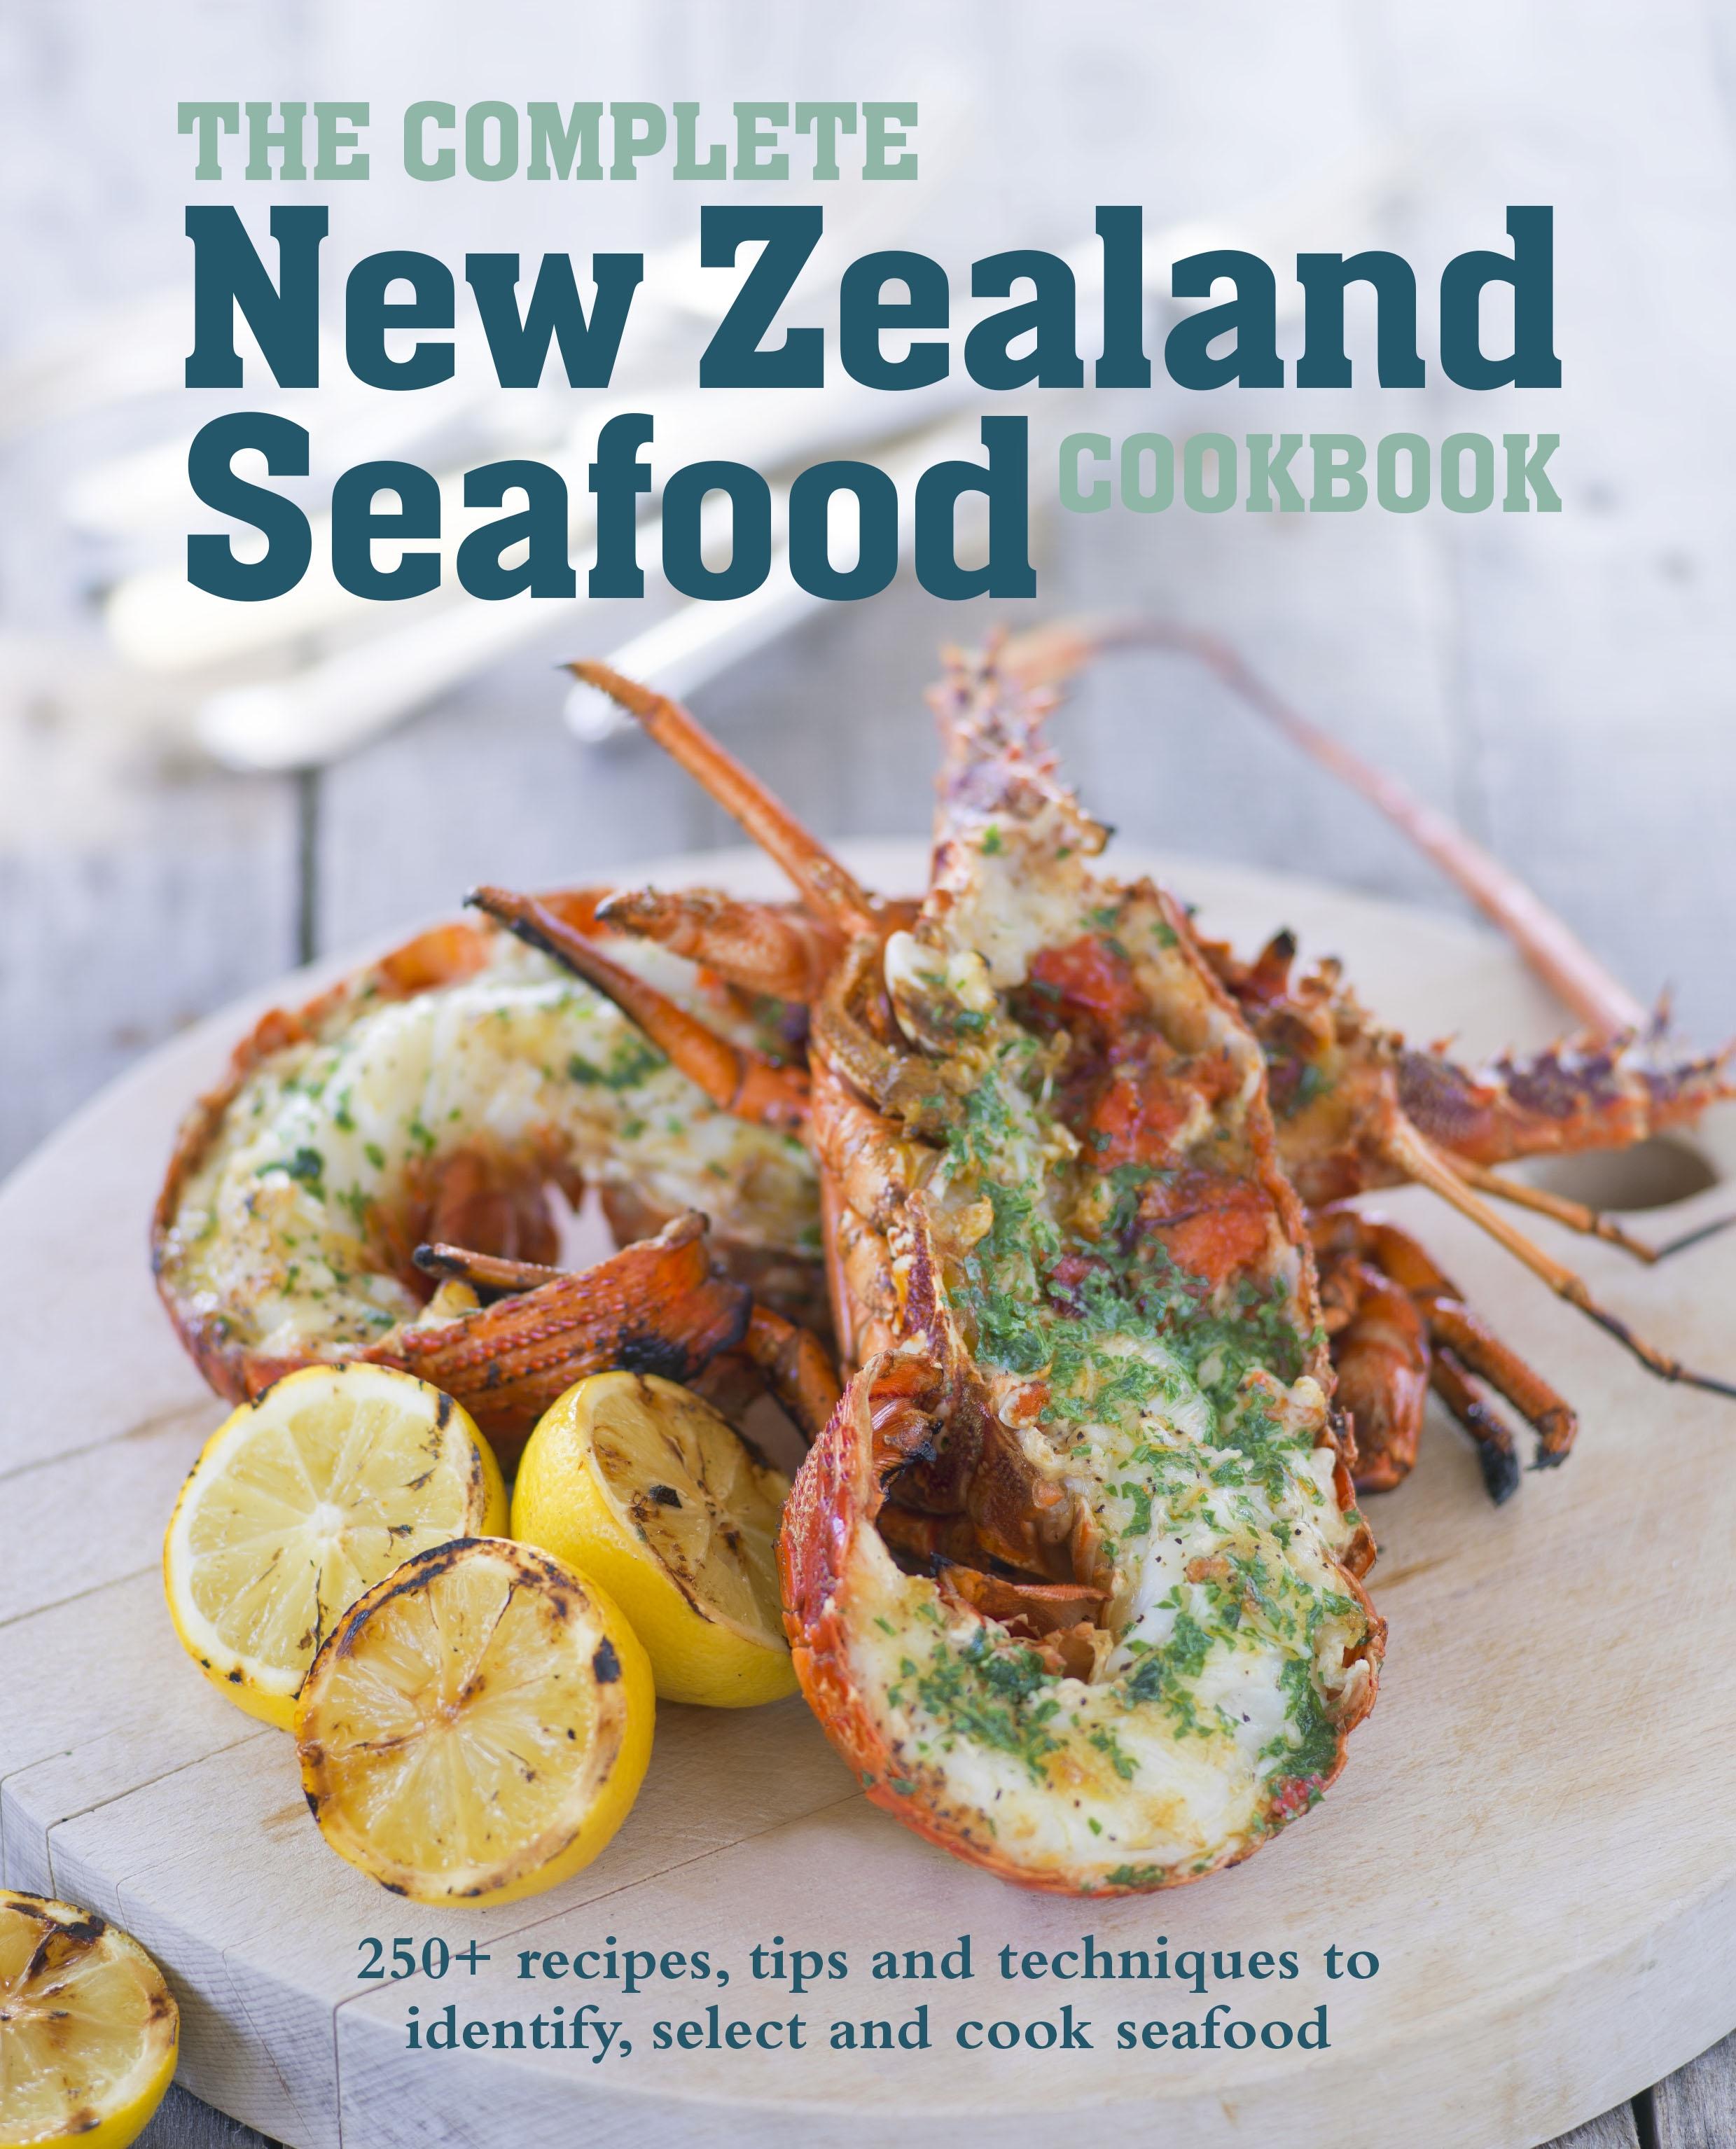 The complete new zealand seafood cookbook penguin books australia the complete new zealand seafood cookbook food drink forumfinder Gallery